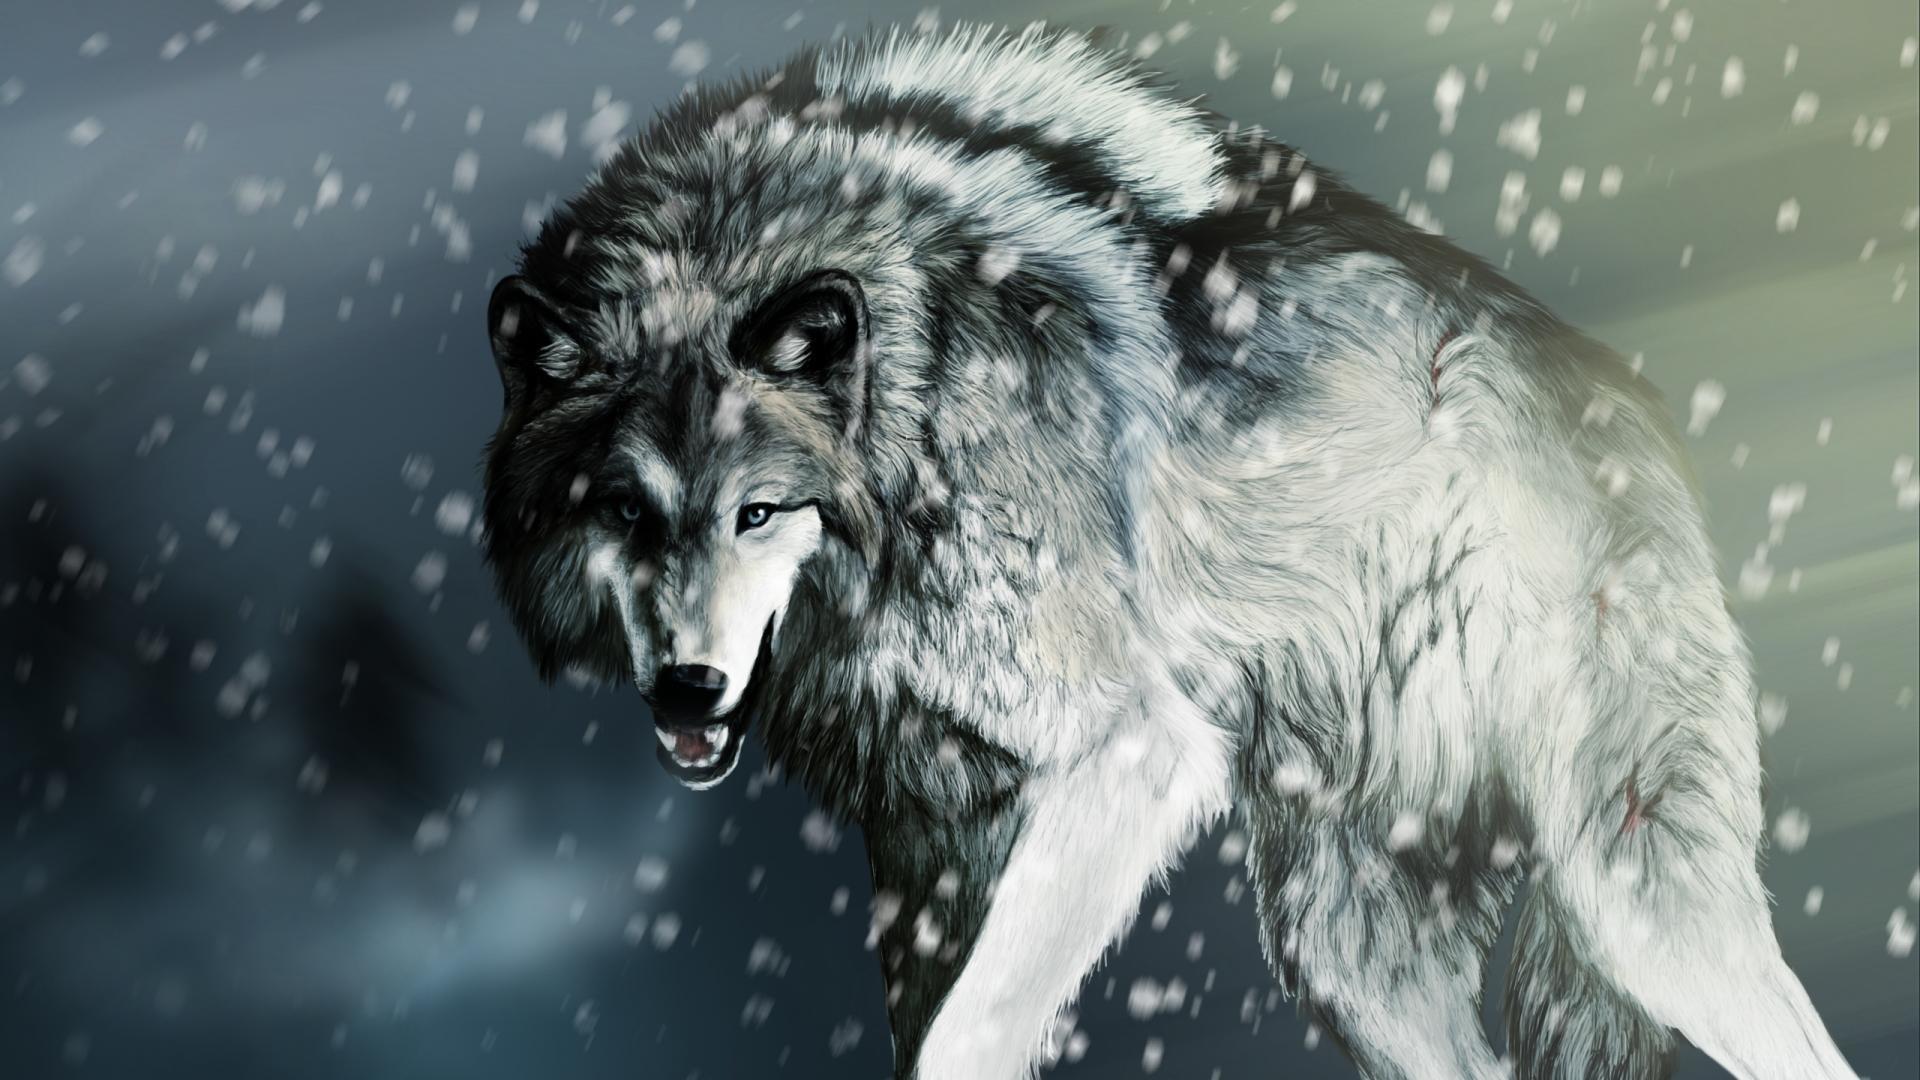 Wolf HD Wallpapers – HD Wallpapers Inn